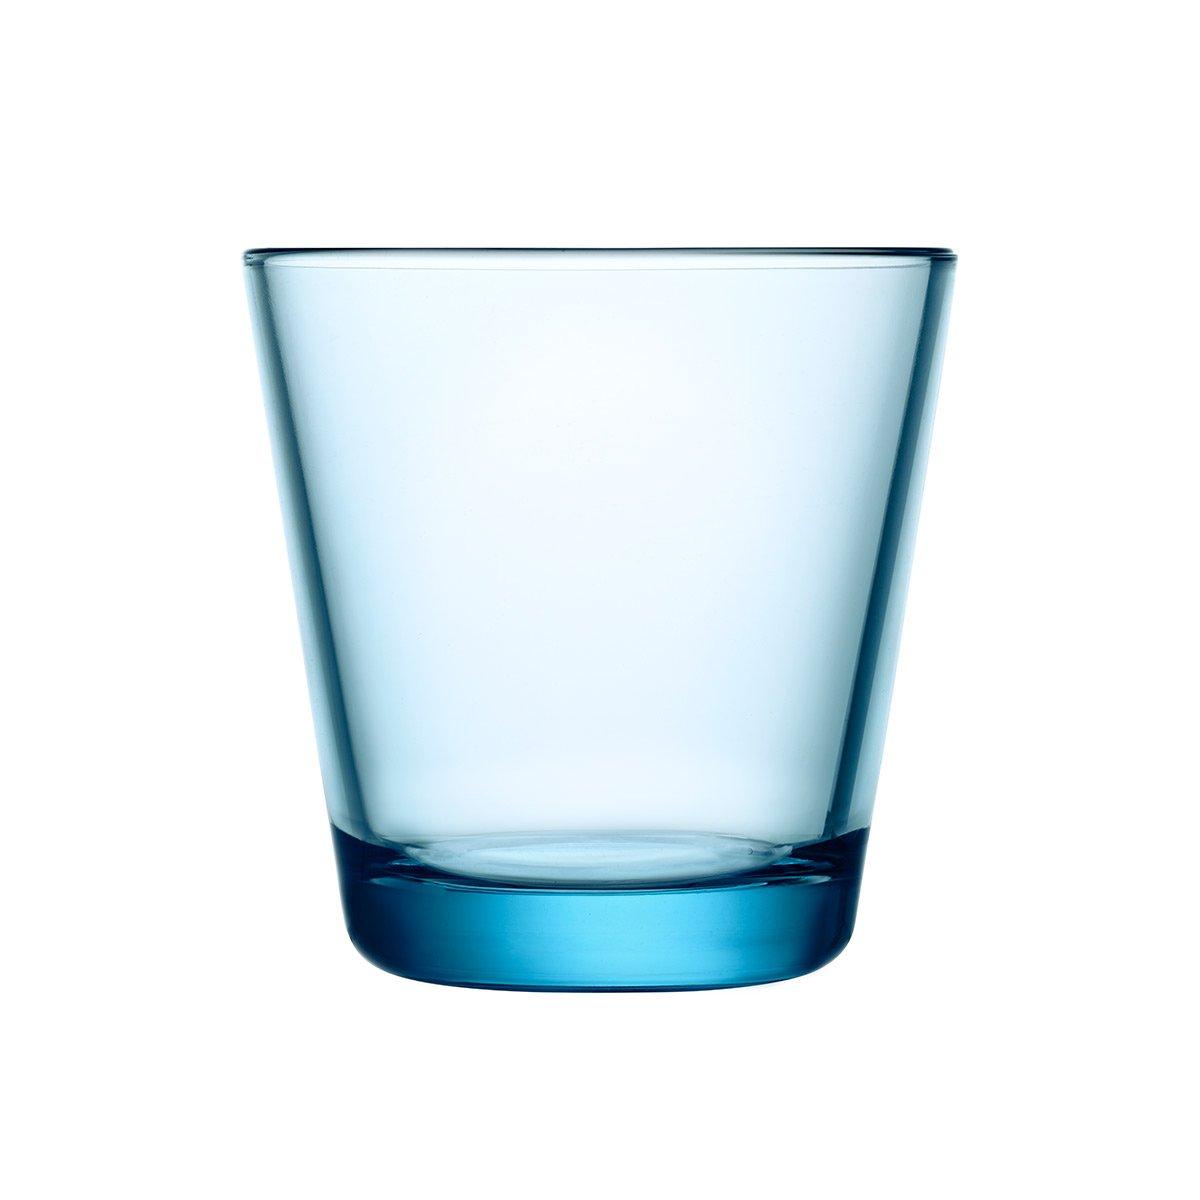 Iittala Kartio Drinking Glass, 2-pc Set, Water Glass, Juice Glass, Glass, Transparent, 210 ml, 1008533